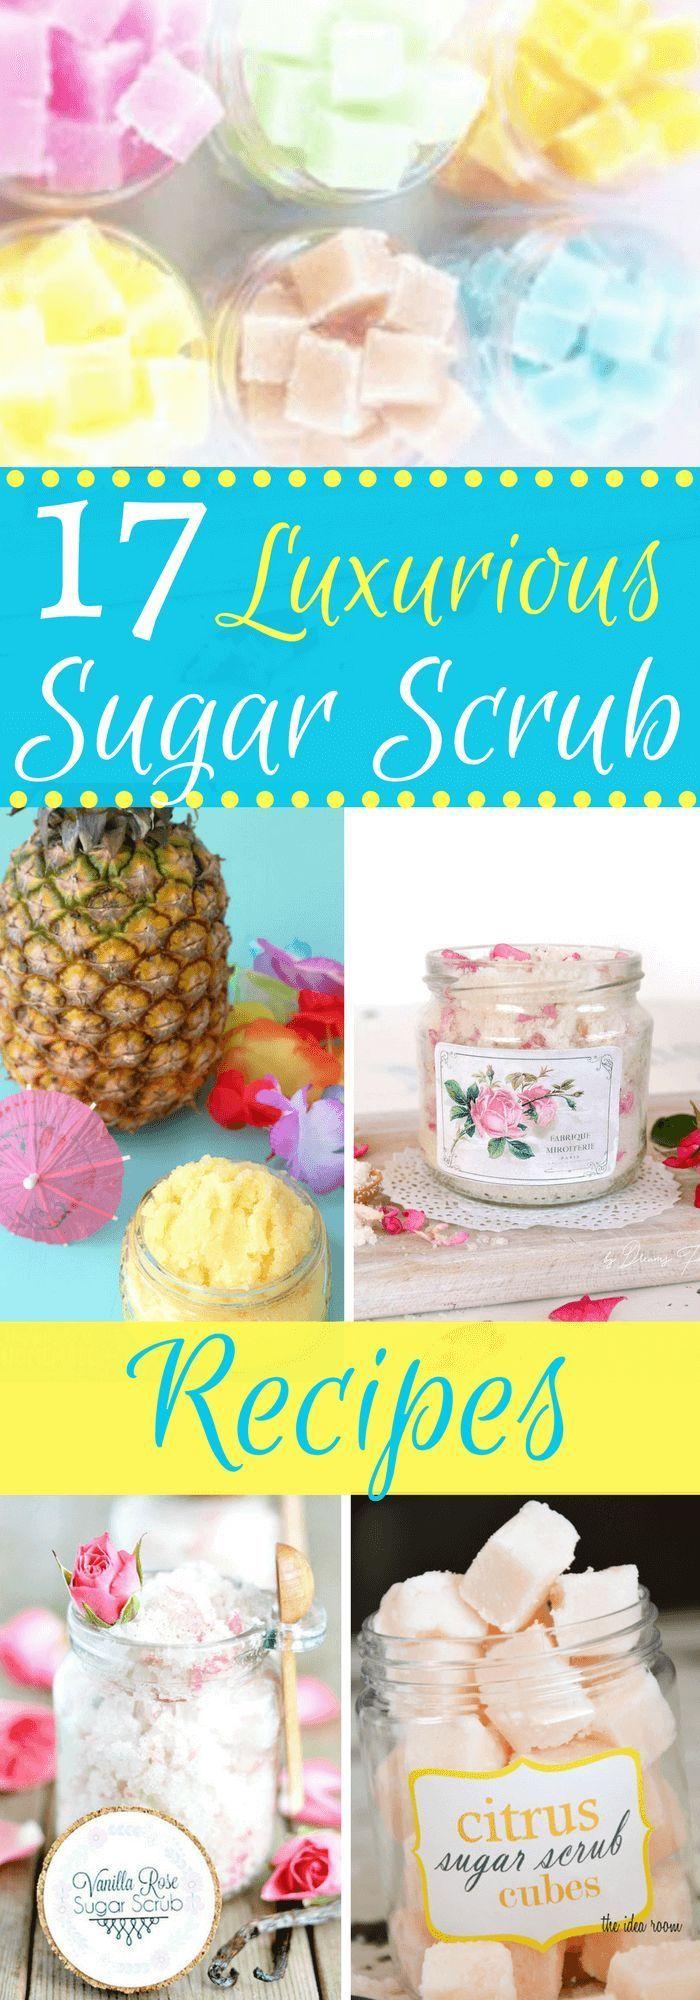 17 Luxuriöse DIY-Zuckerpeeling-Rezepte  #luxuriose #rezepte #zuckerpeeling #sugarscrubrecipe